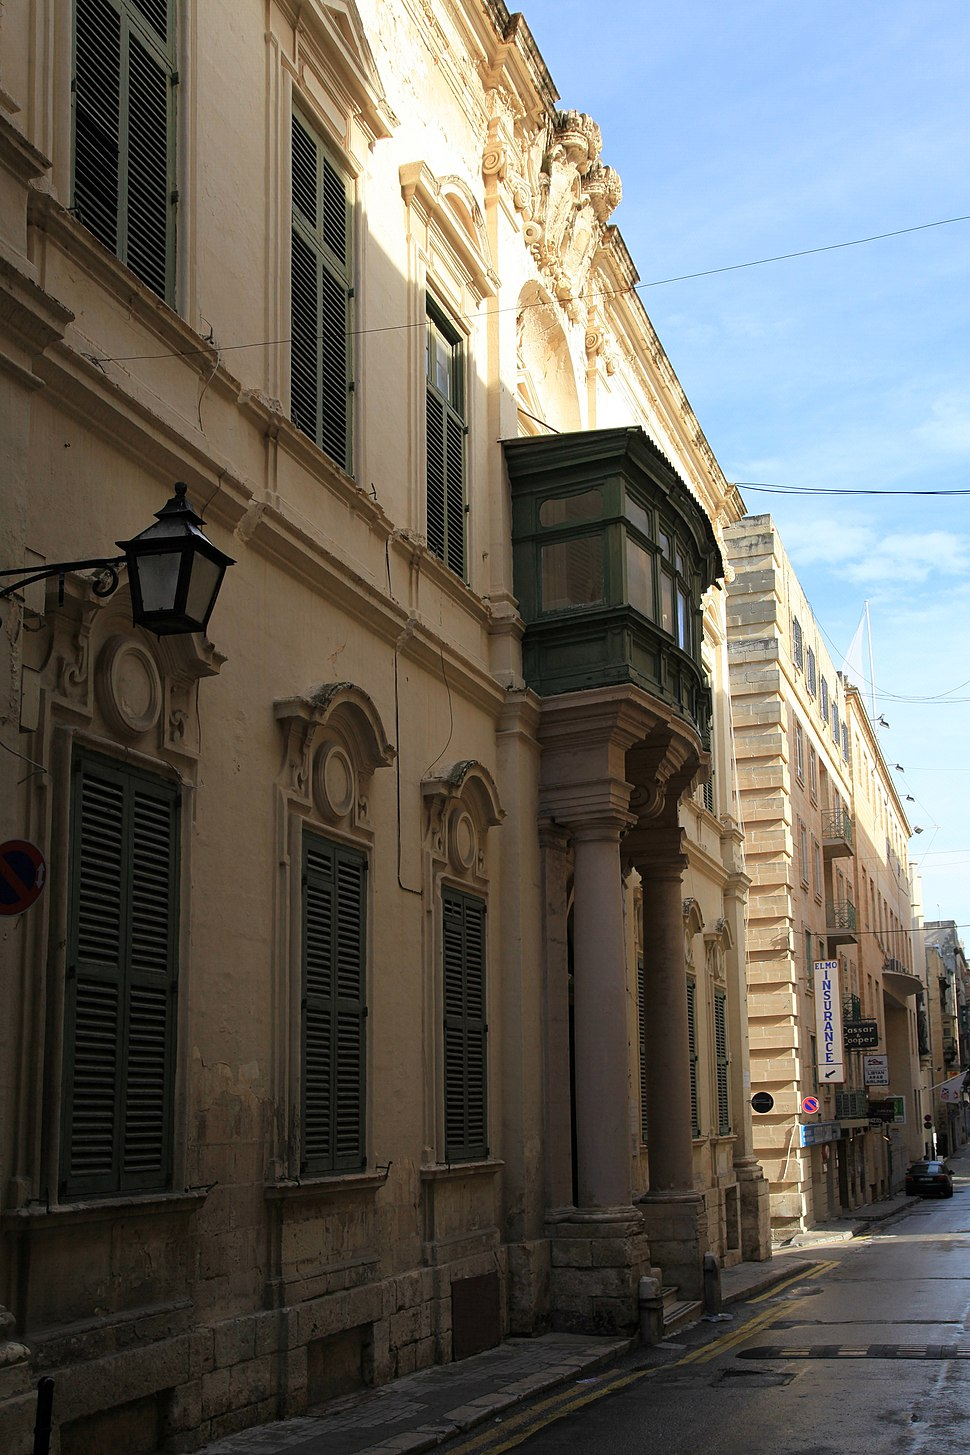 Malta - Valletta - Triq Nofs-in-Nhar - National Museum of Fine Arts 05 ies